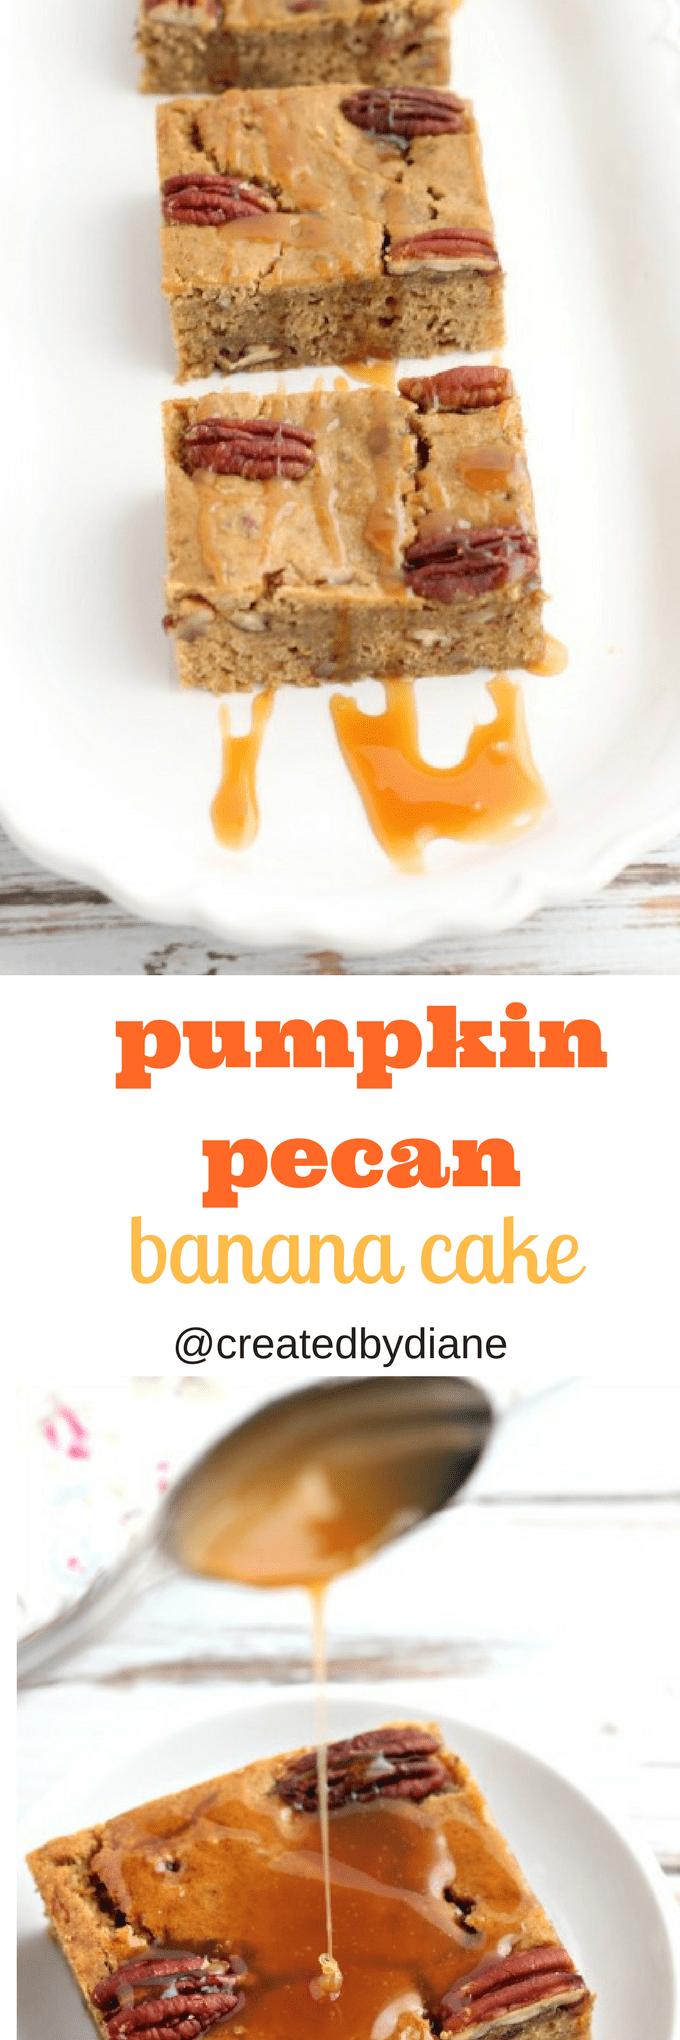 pumpkin pecan banana cake @createdbydiane